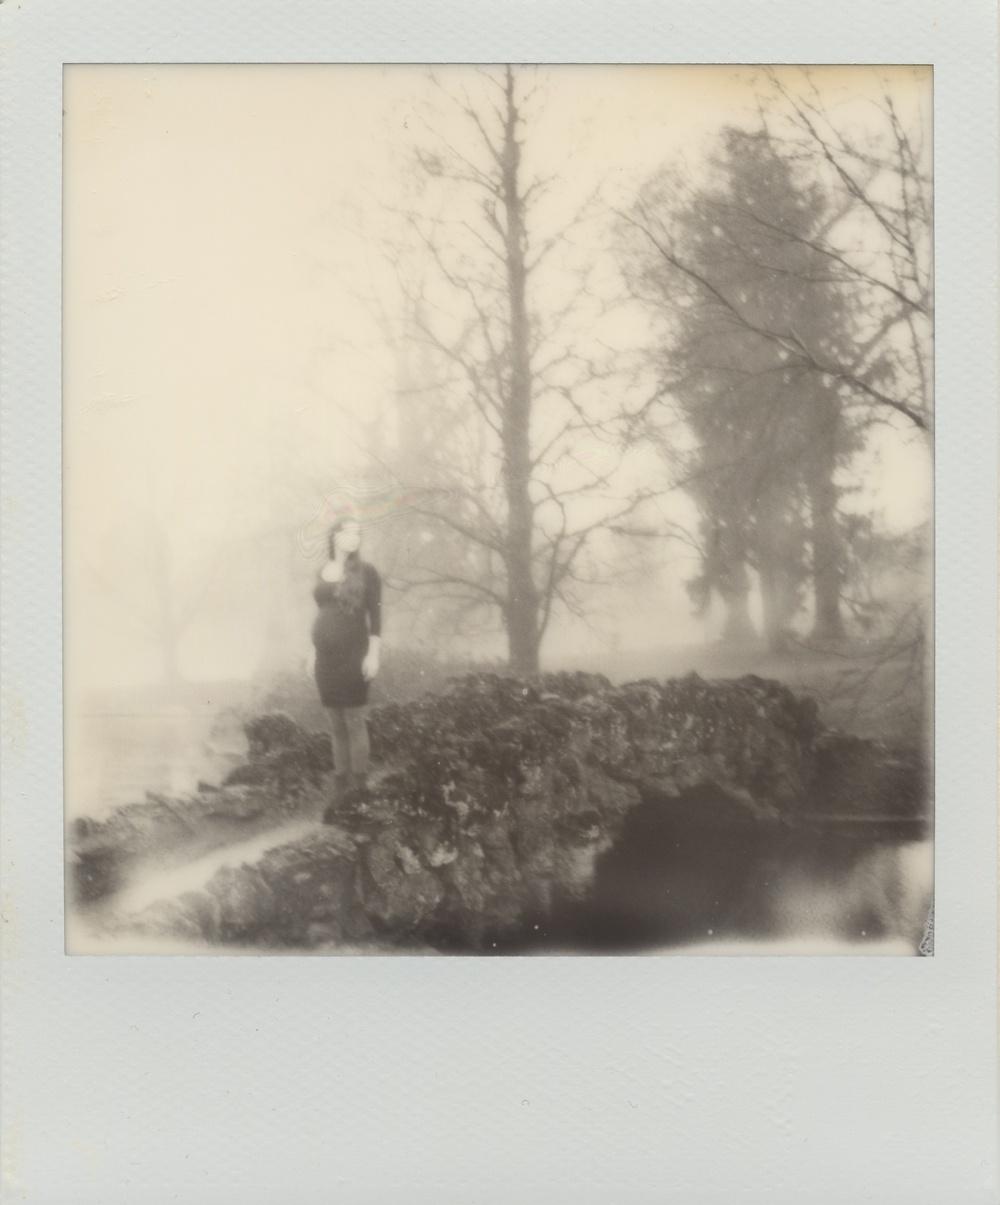 polaroid_2945.jpg